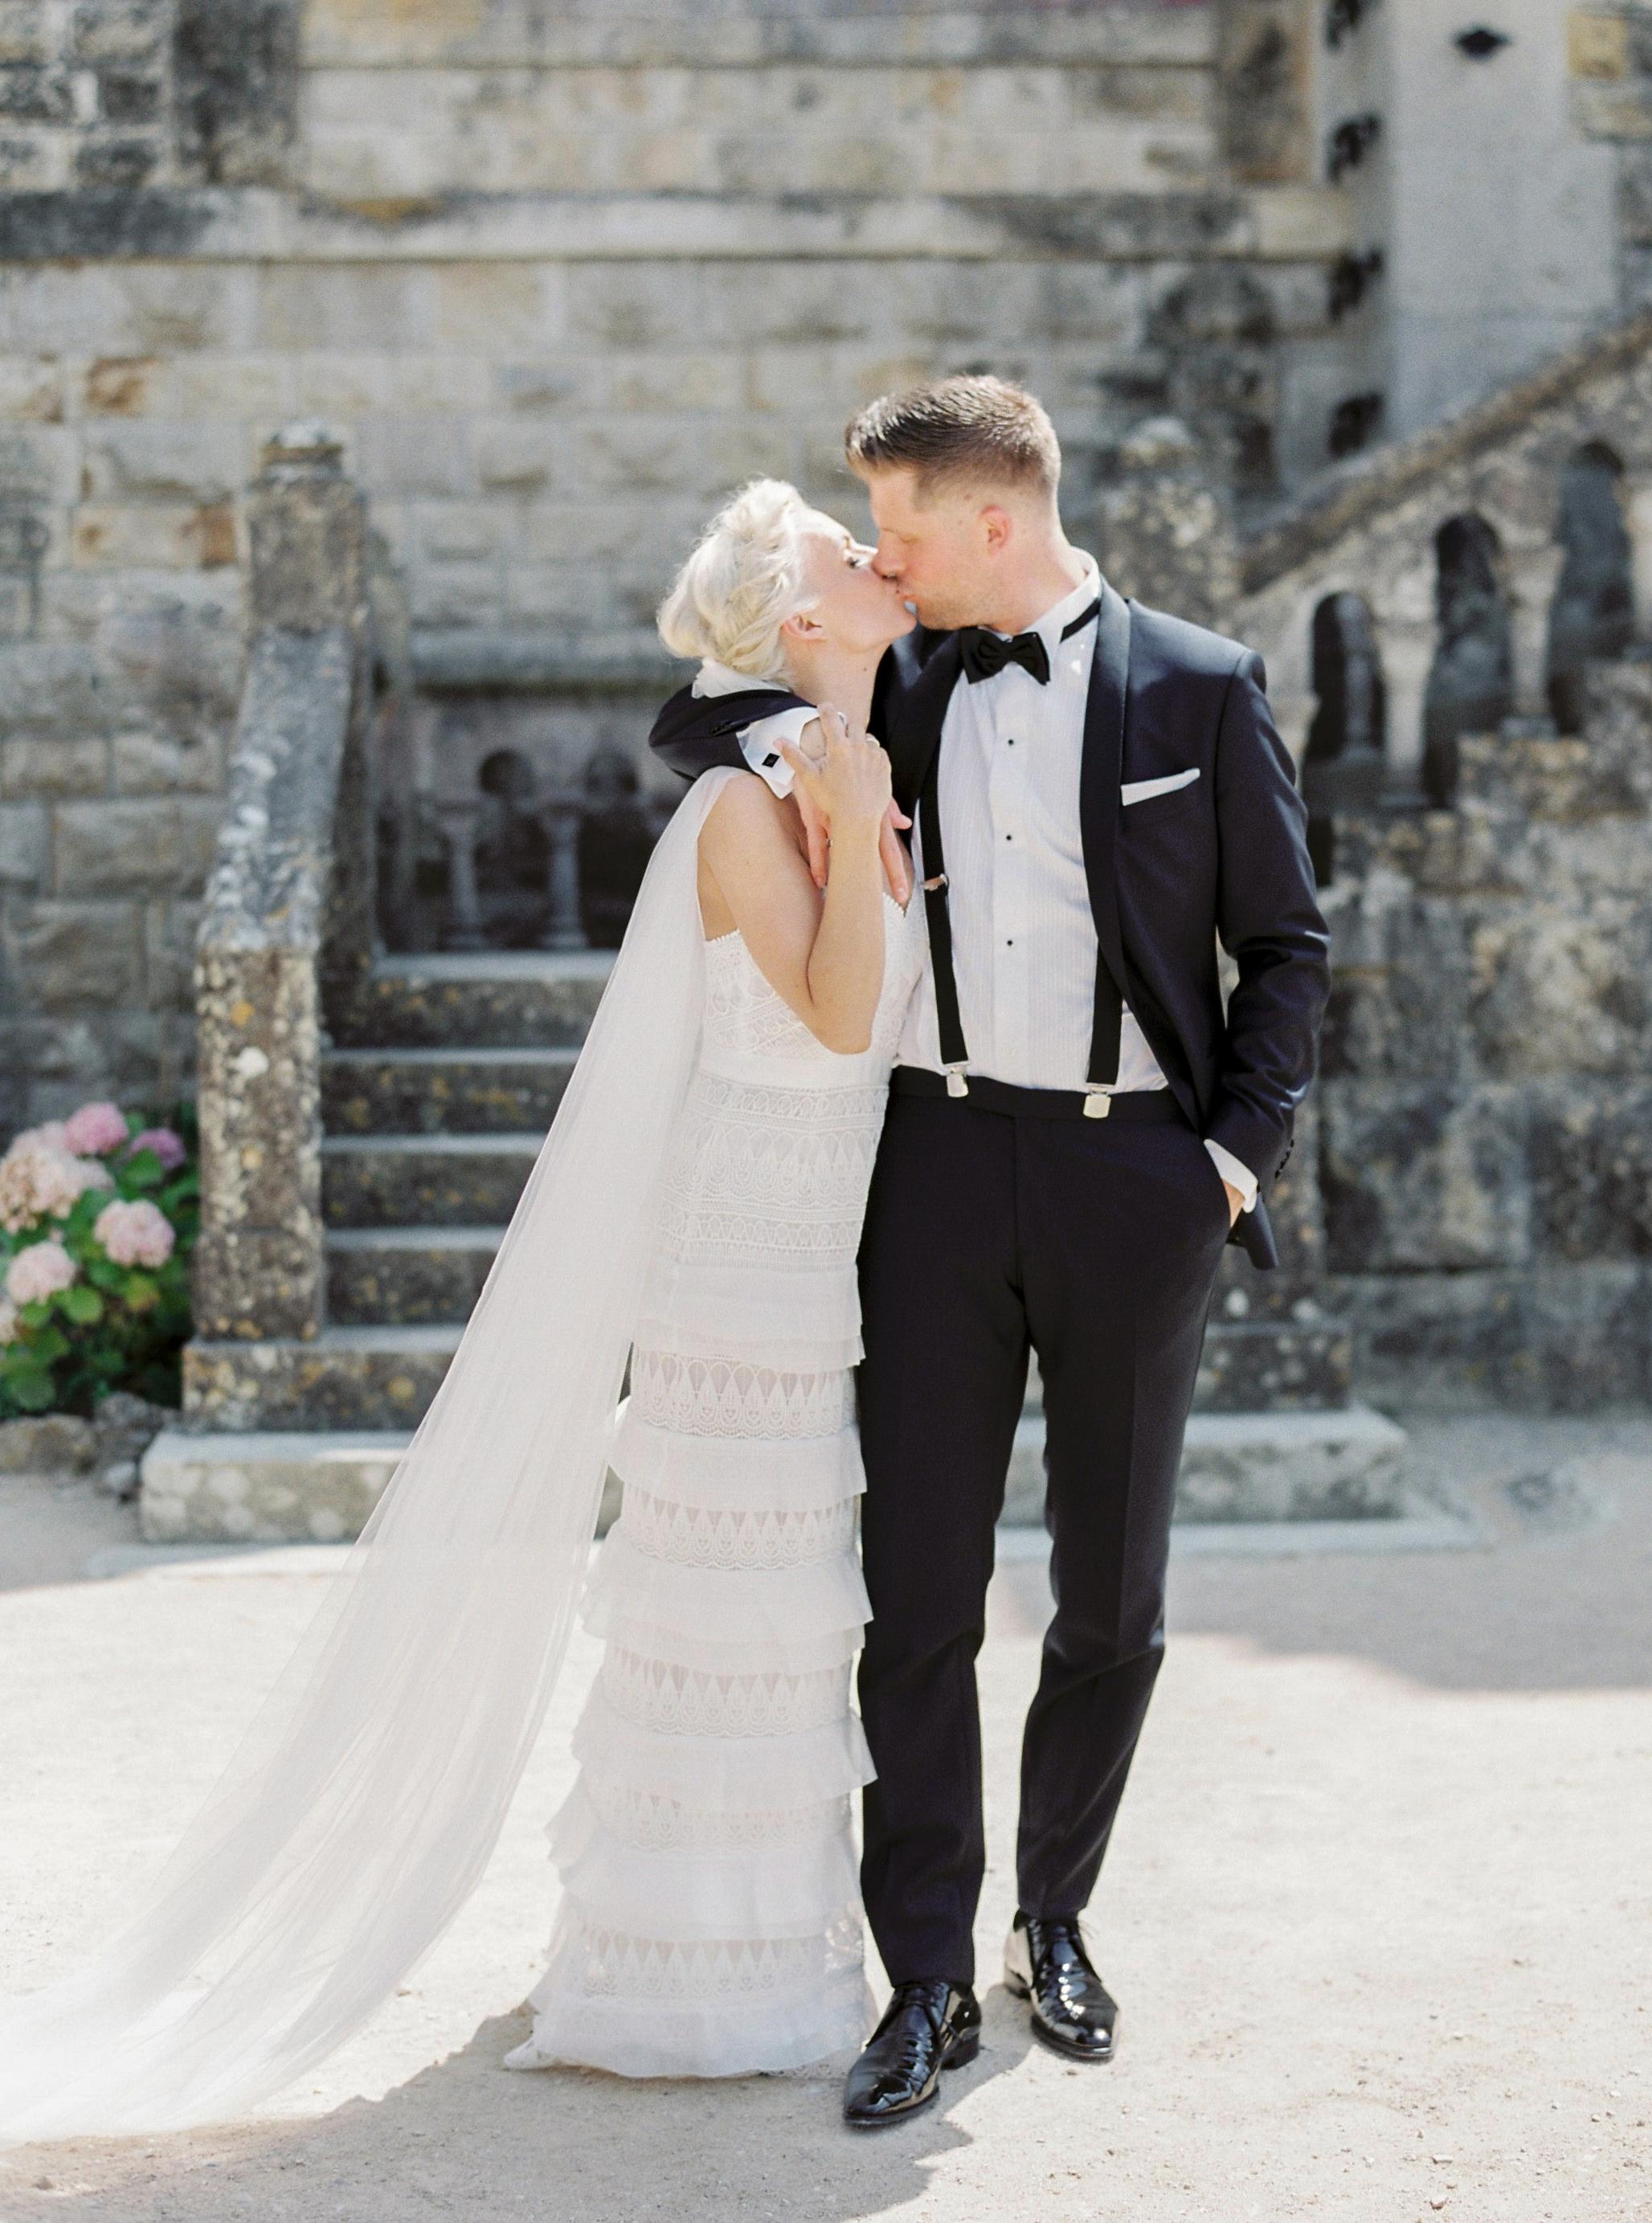 Nastia_Vesna_Photography_Wedding_Portugal_33.jpg